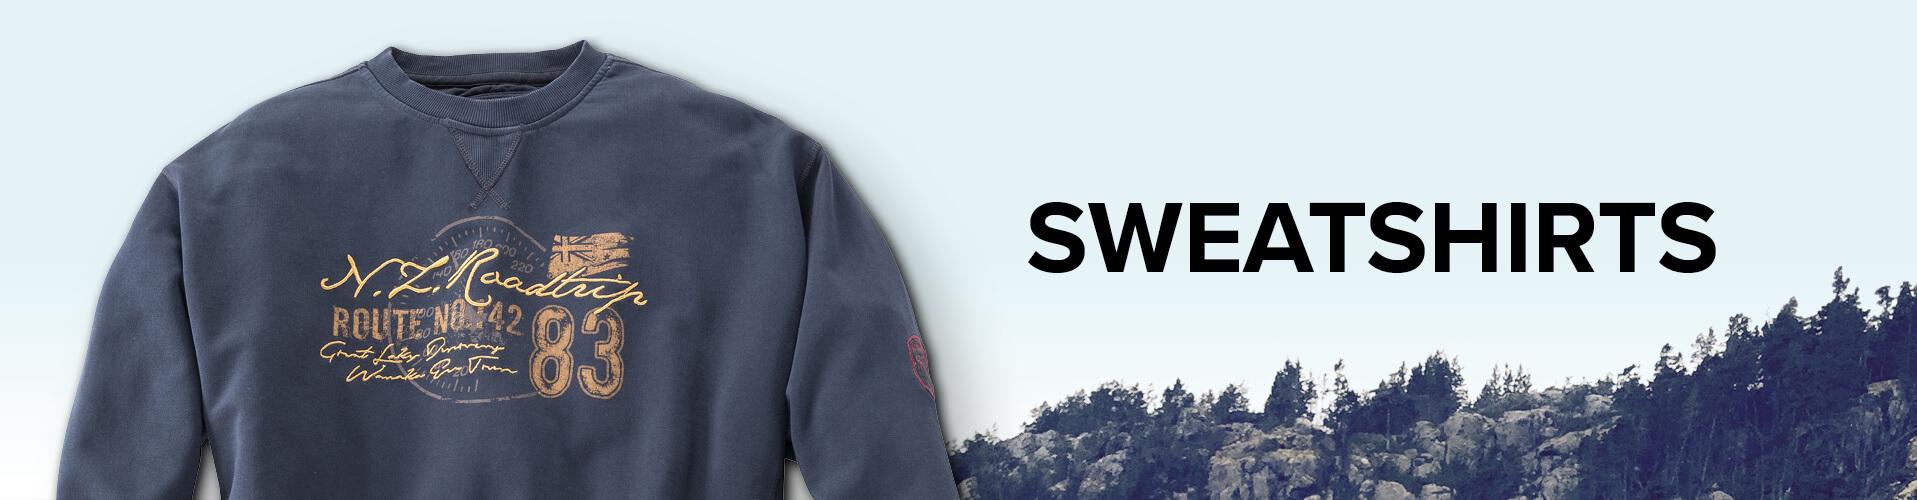 Sweatshirts Schmuckbild